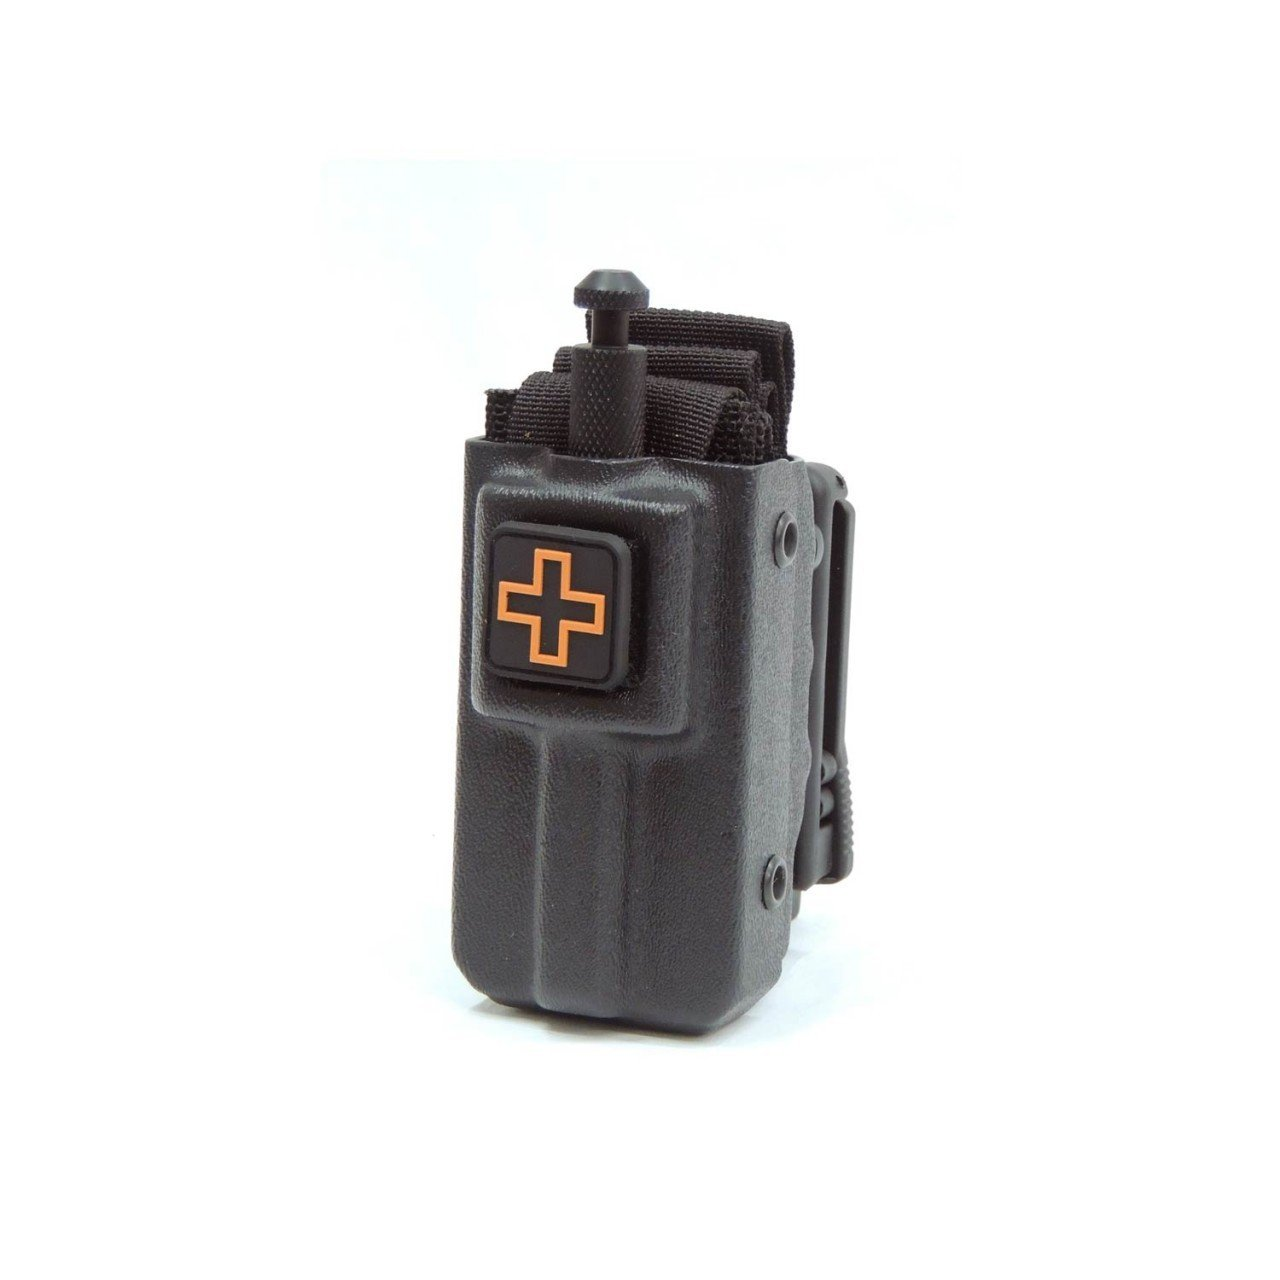 Eleven 10 – 1110 Gear Kydex Sof®tt Wide Tourniquet Case (New Design)-black Belt Attachment (Tek-lok)